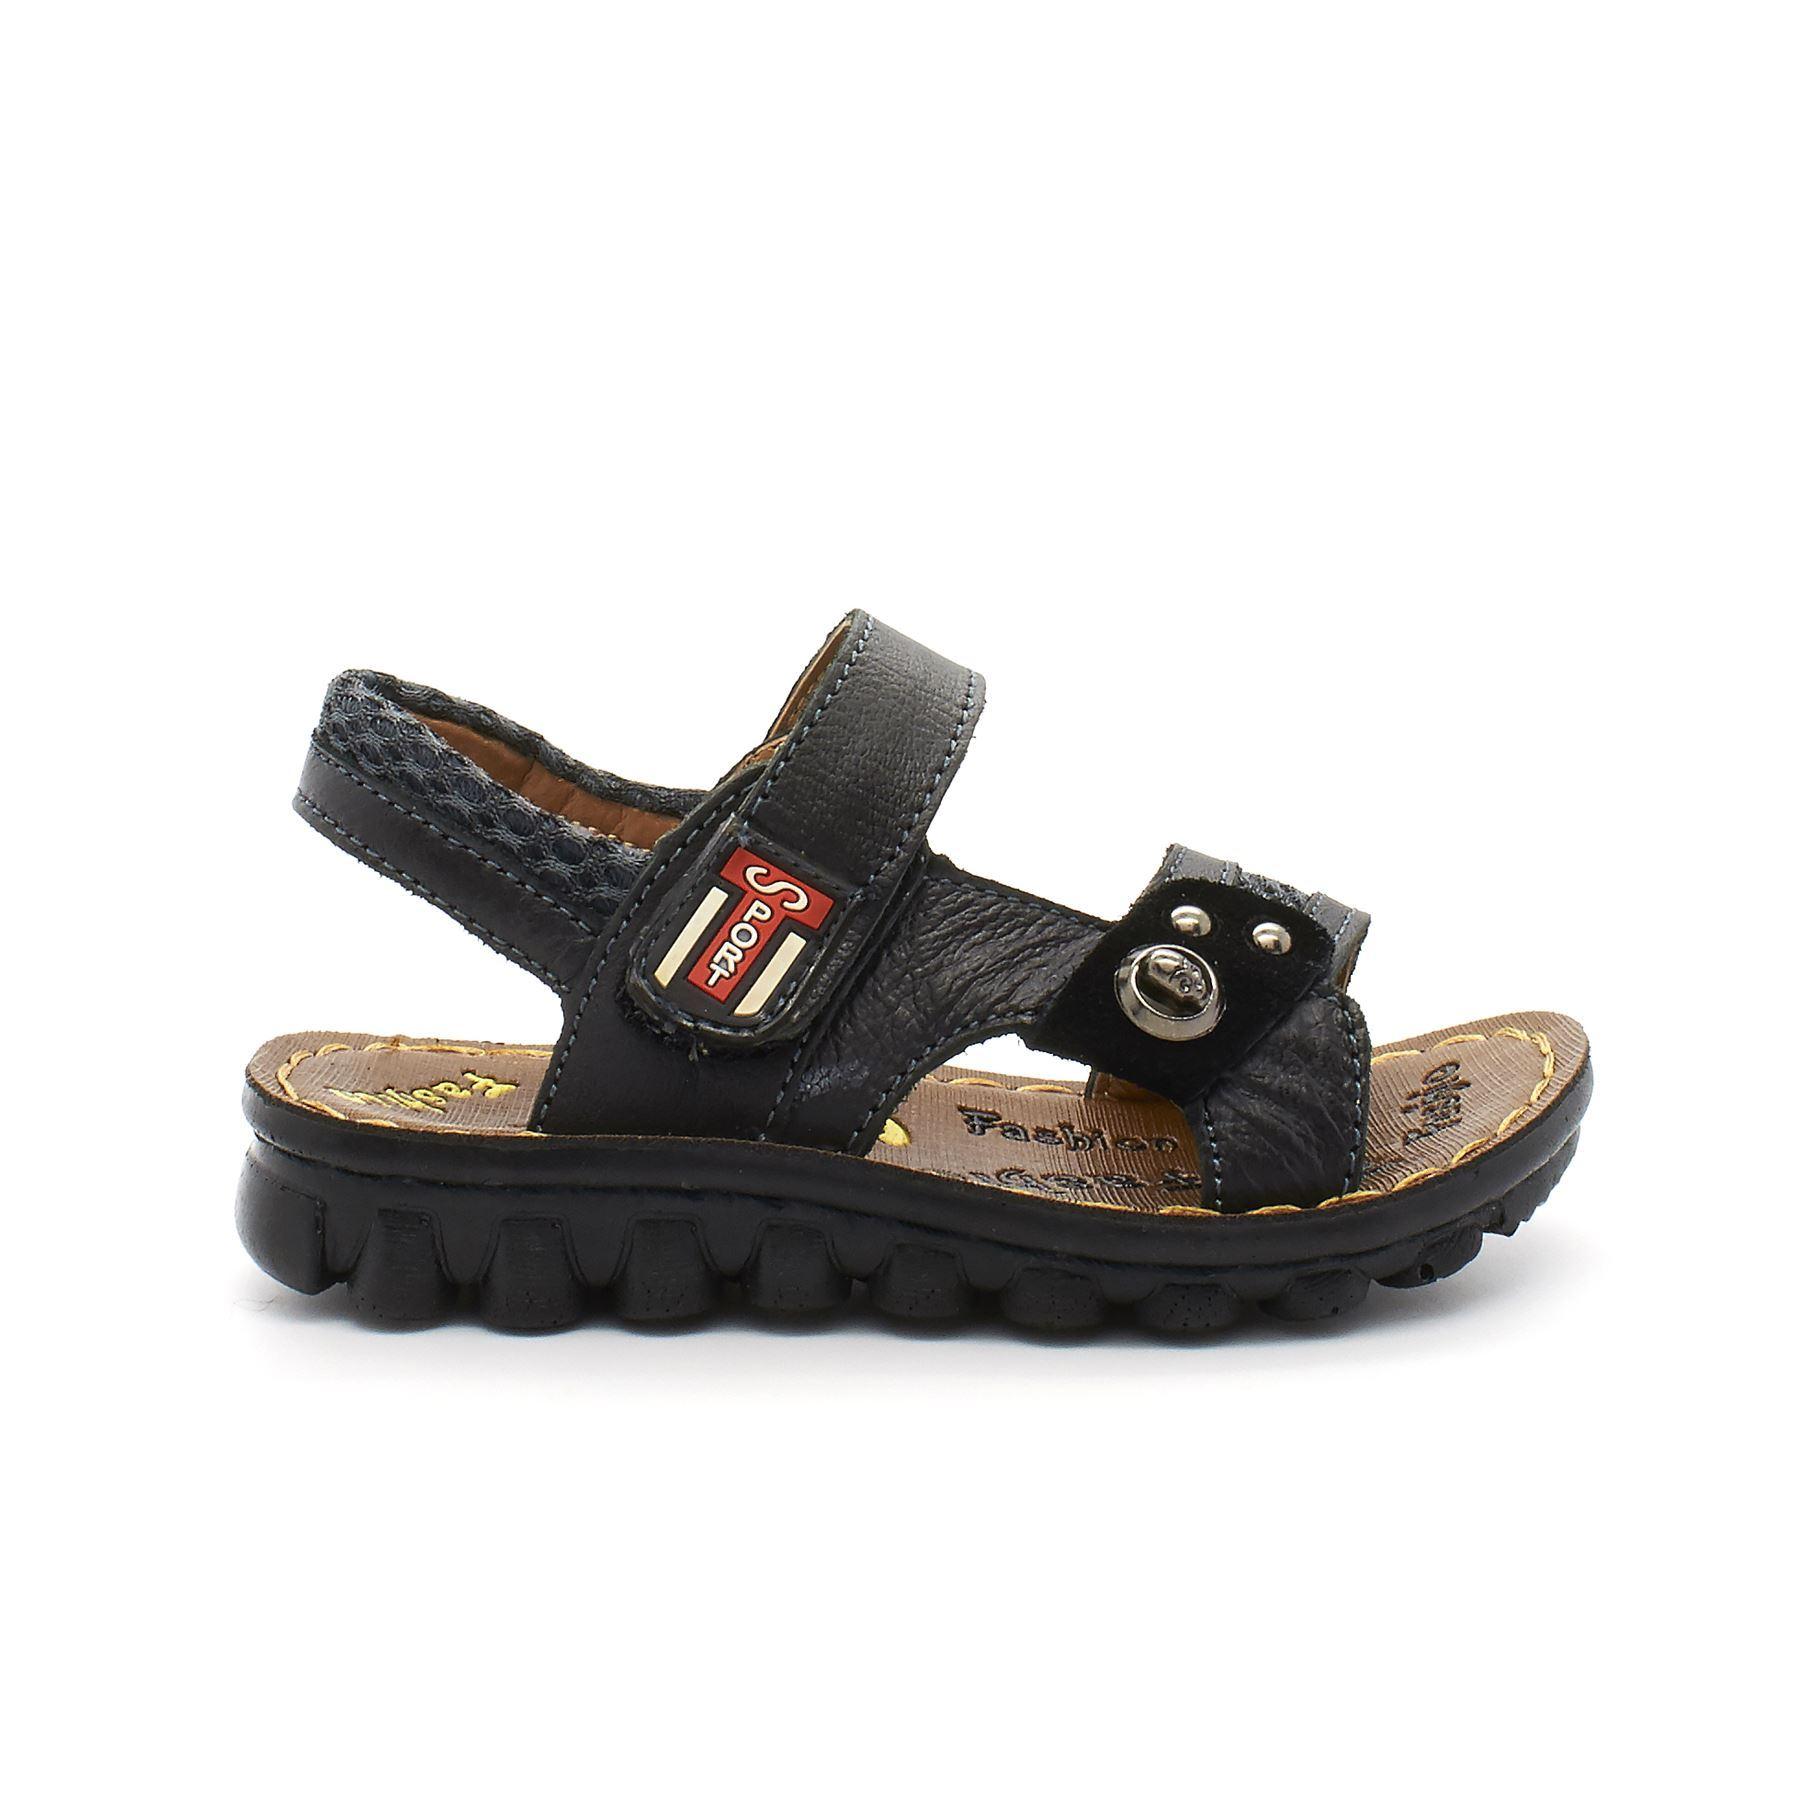 Chicos Niños Verano Velcro Deportes Niños Paseo Playa Sandalias Zapatos Talla Negro Reino Unido